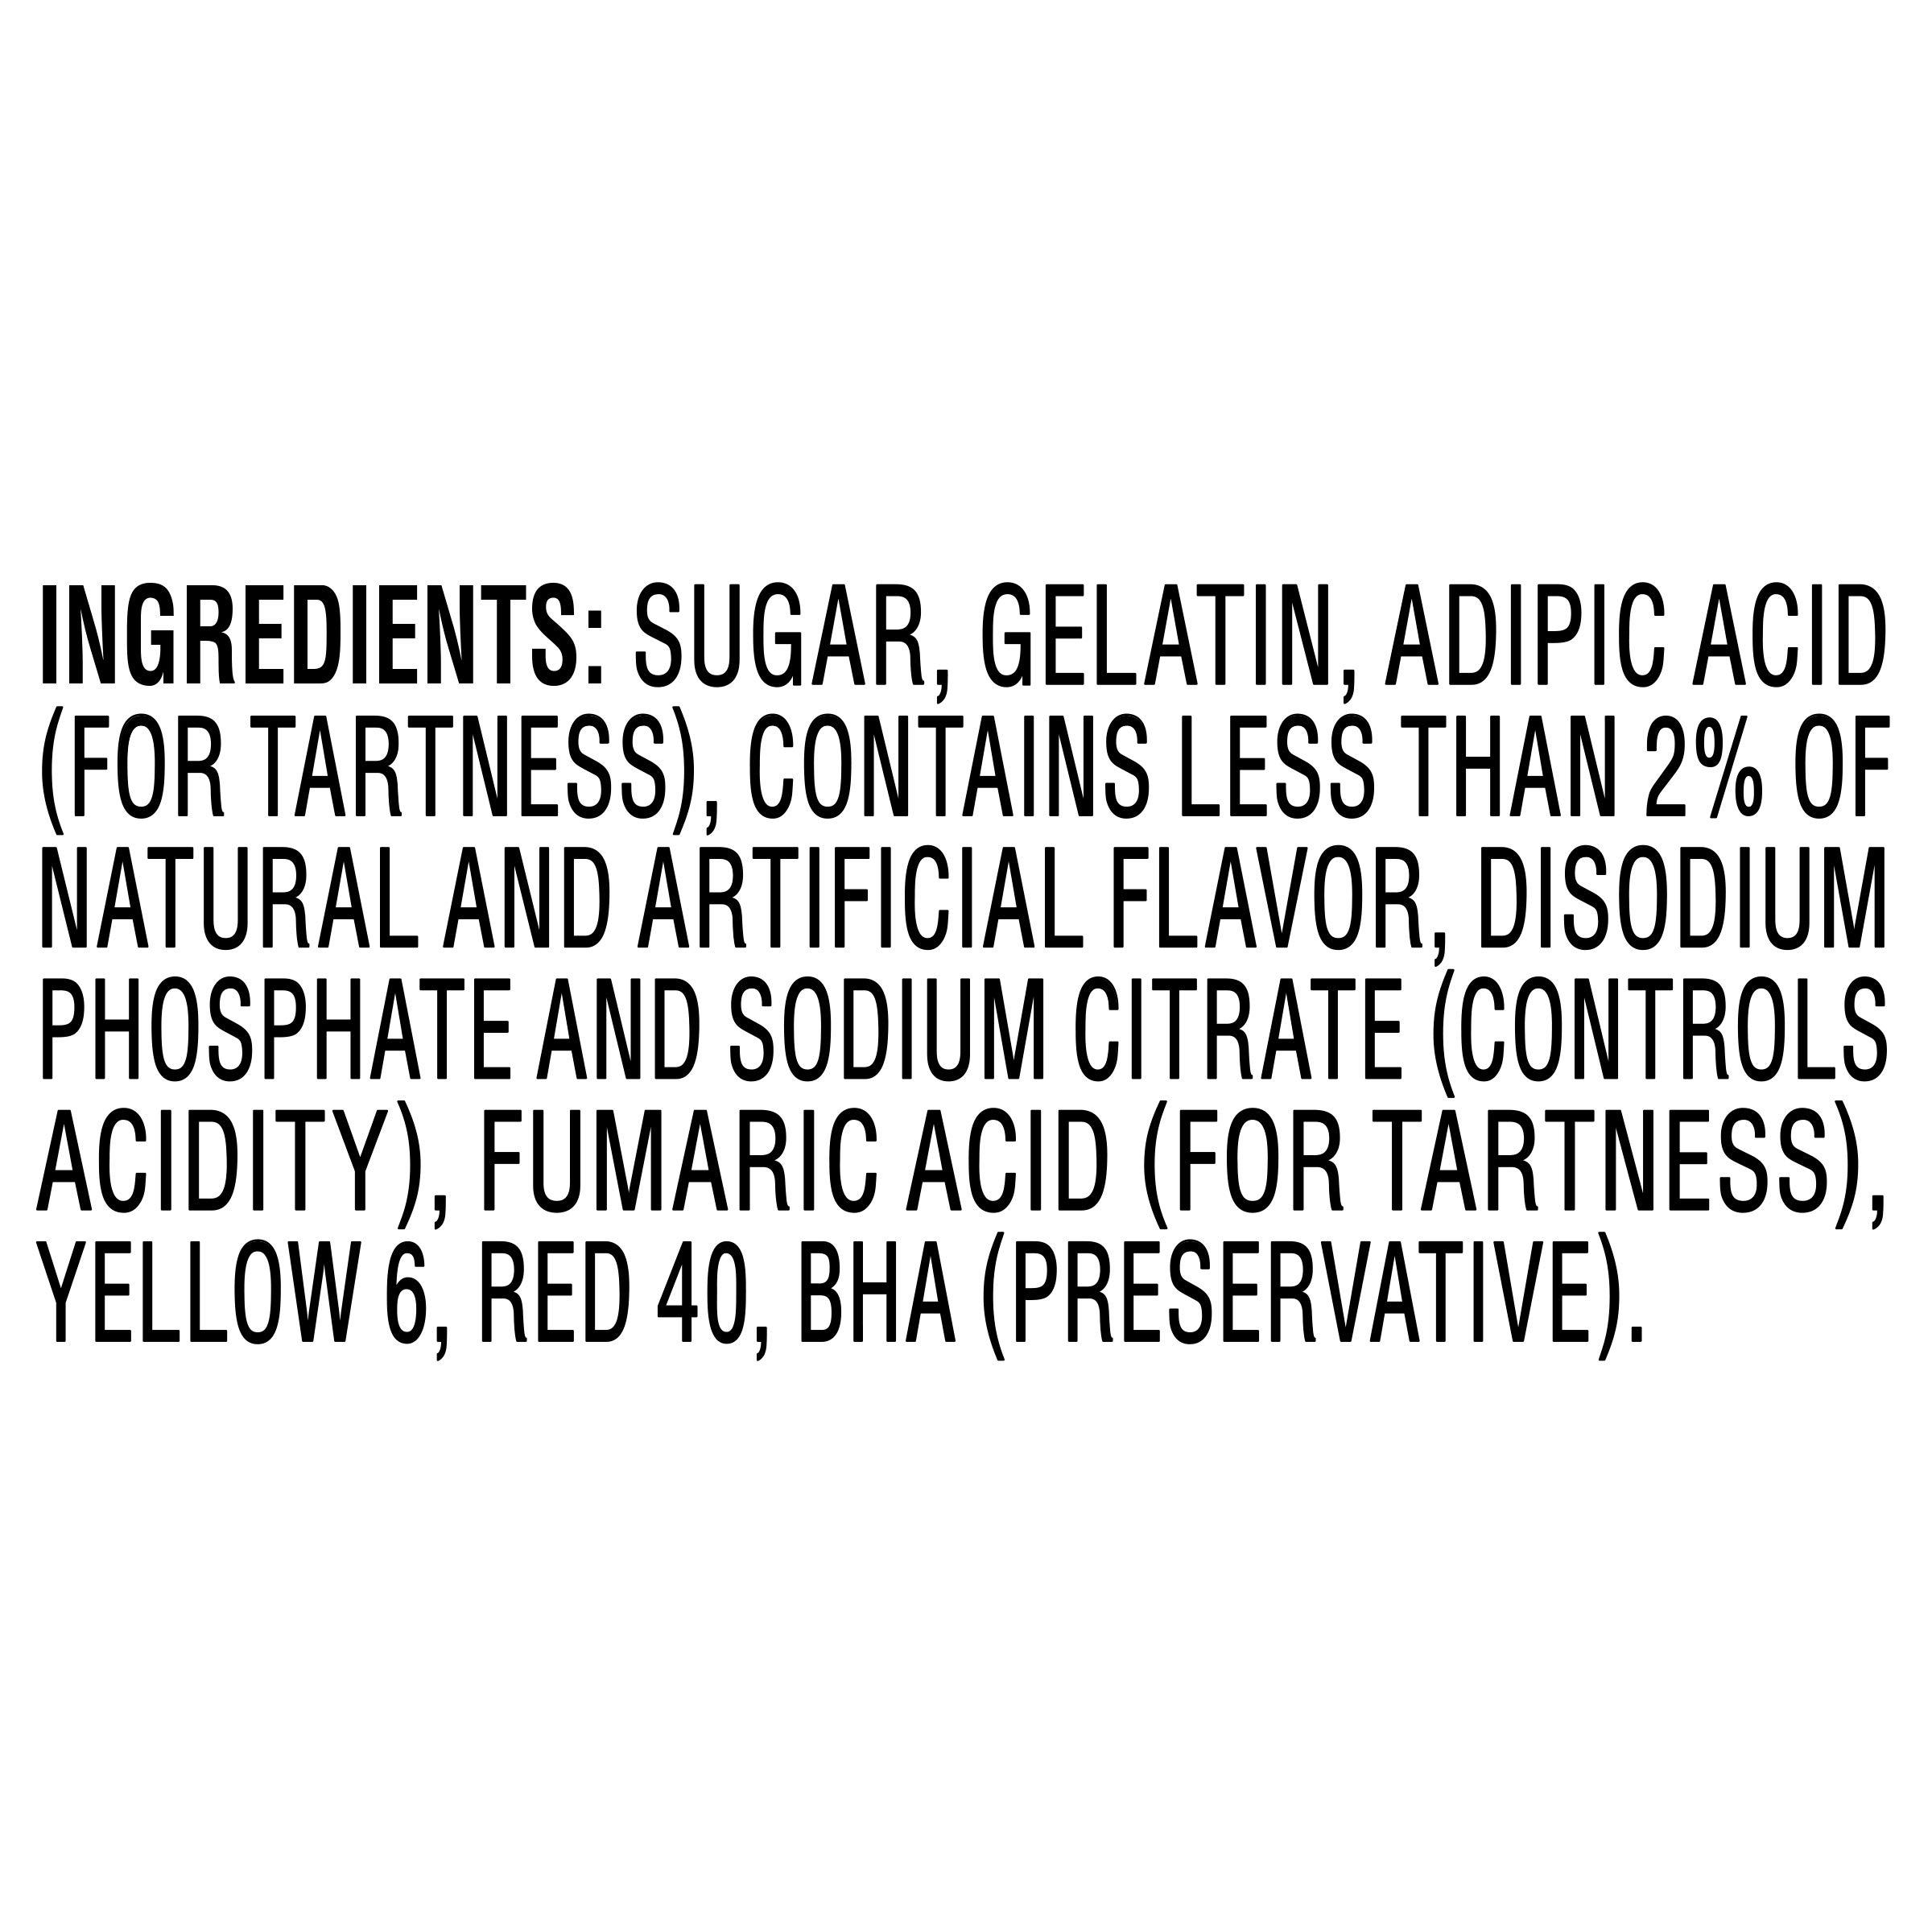 Jell-O Orange Gelatin Dessert Mix, 6 oz Box by Jell-O (Image #3)